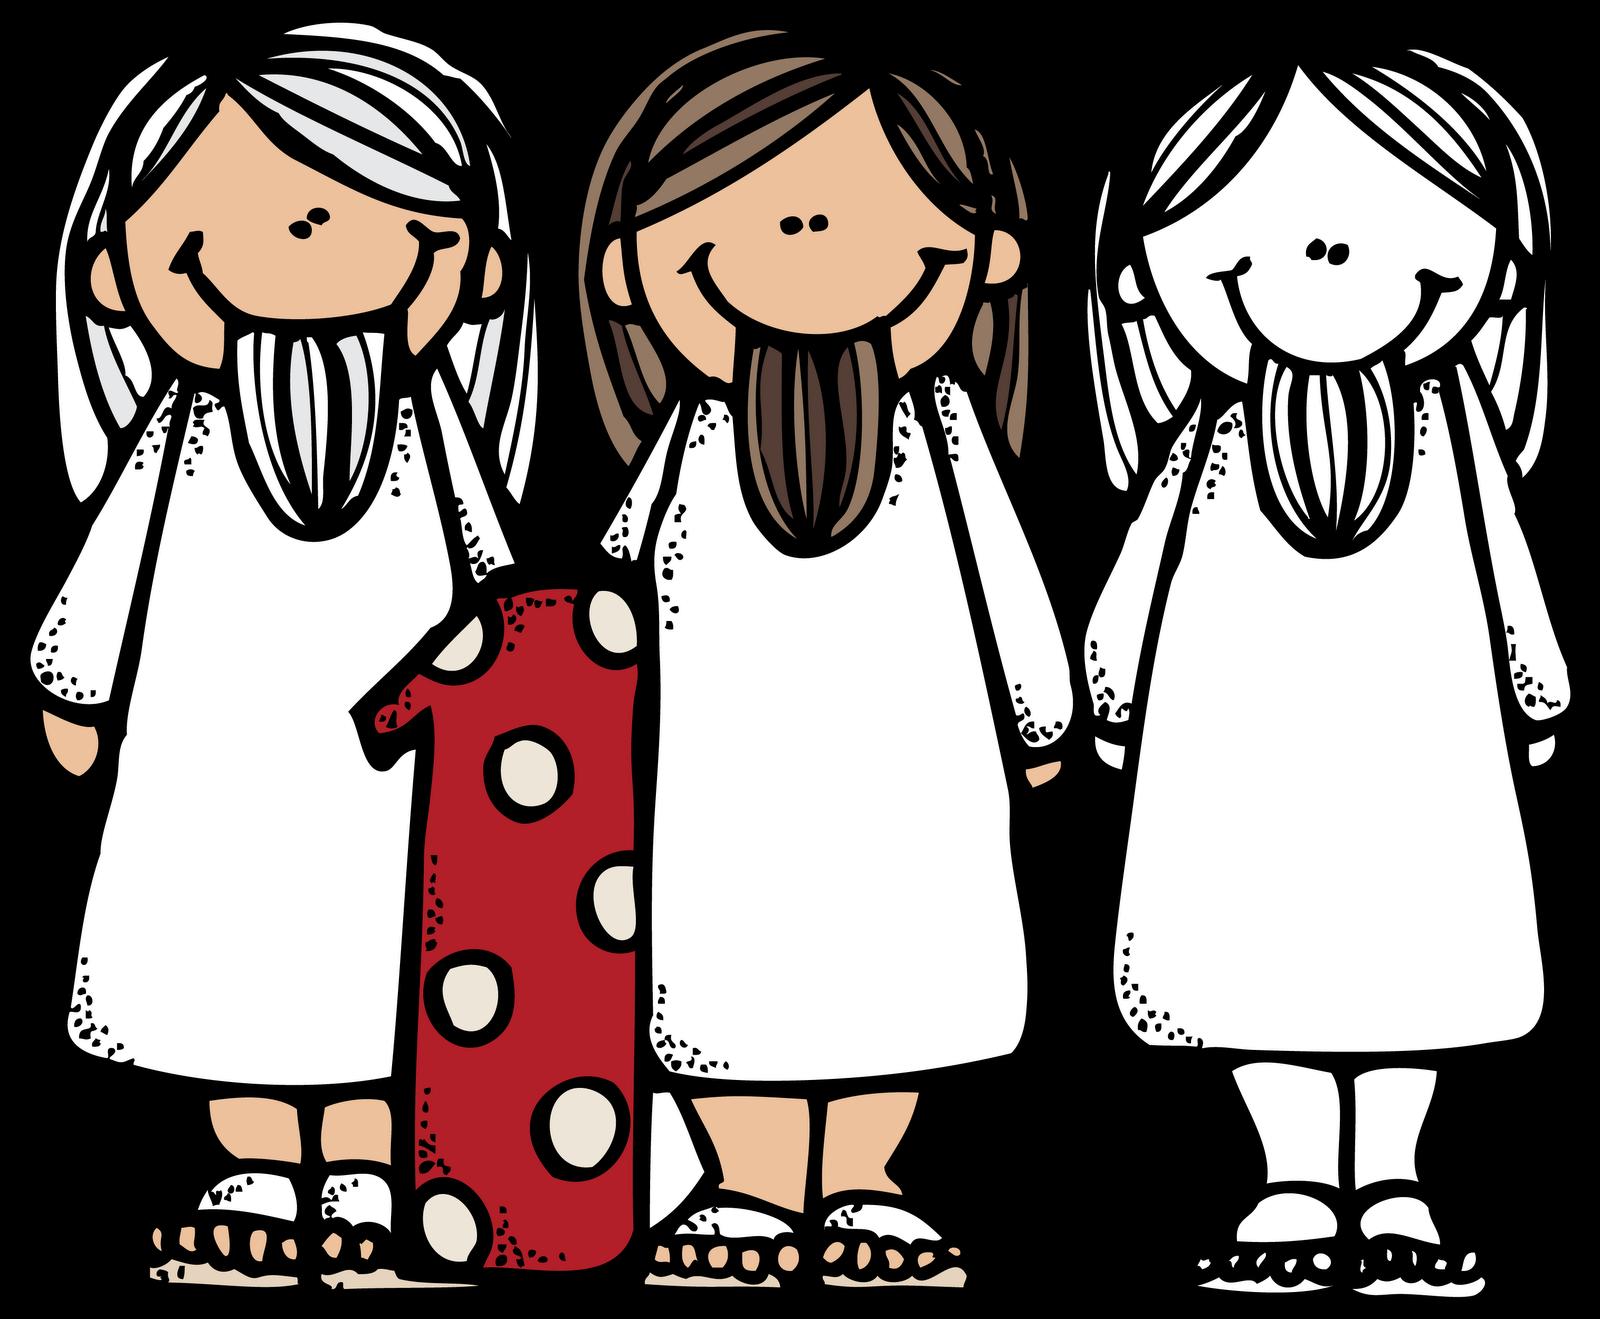 1600x1319 Melonheadz Lds Illustrating Articles Of Faith Illustrations